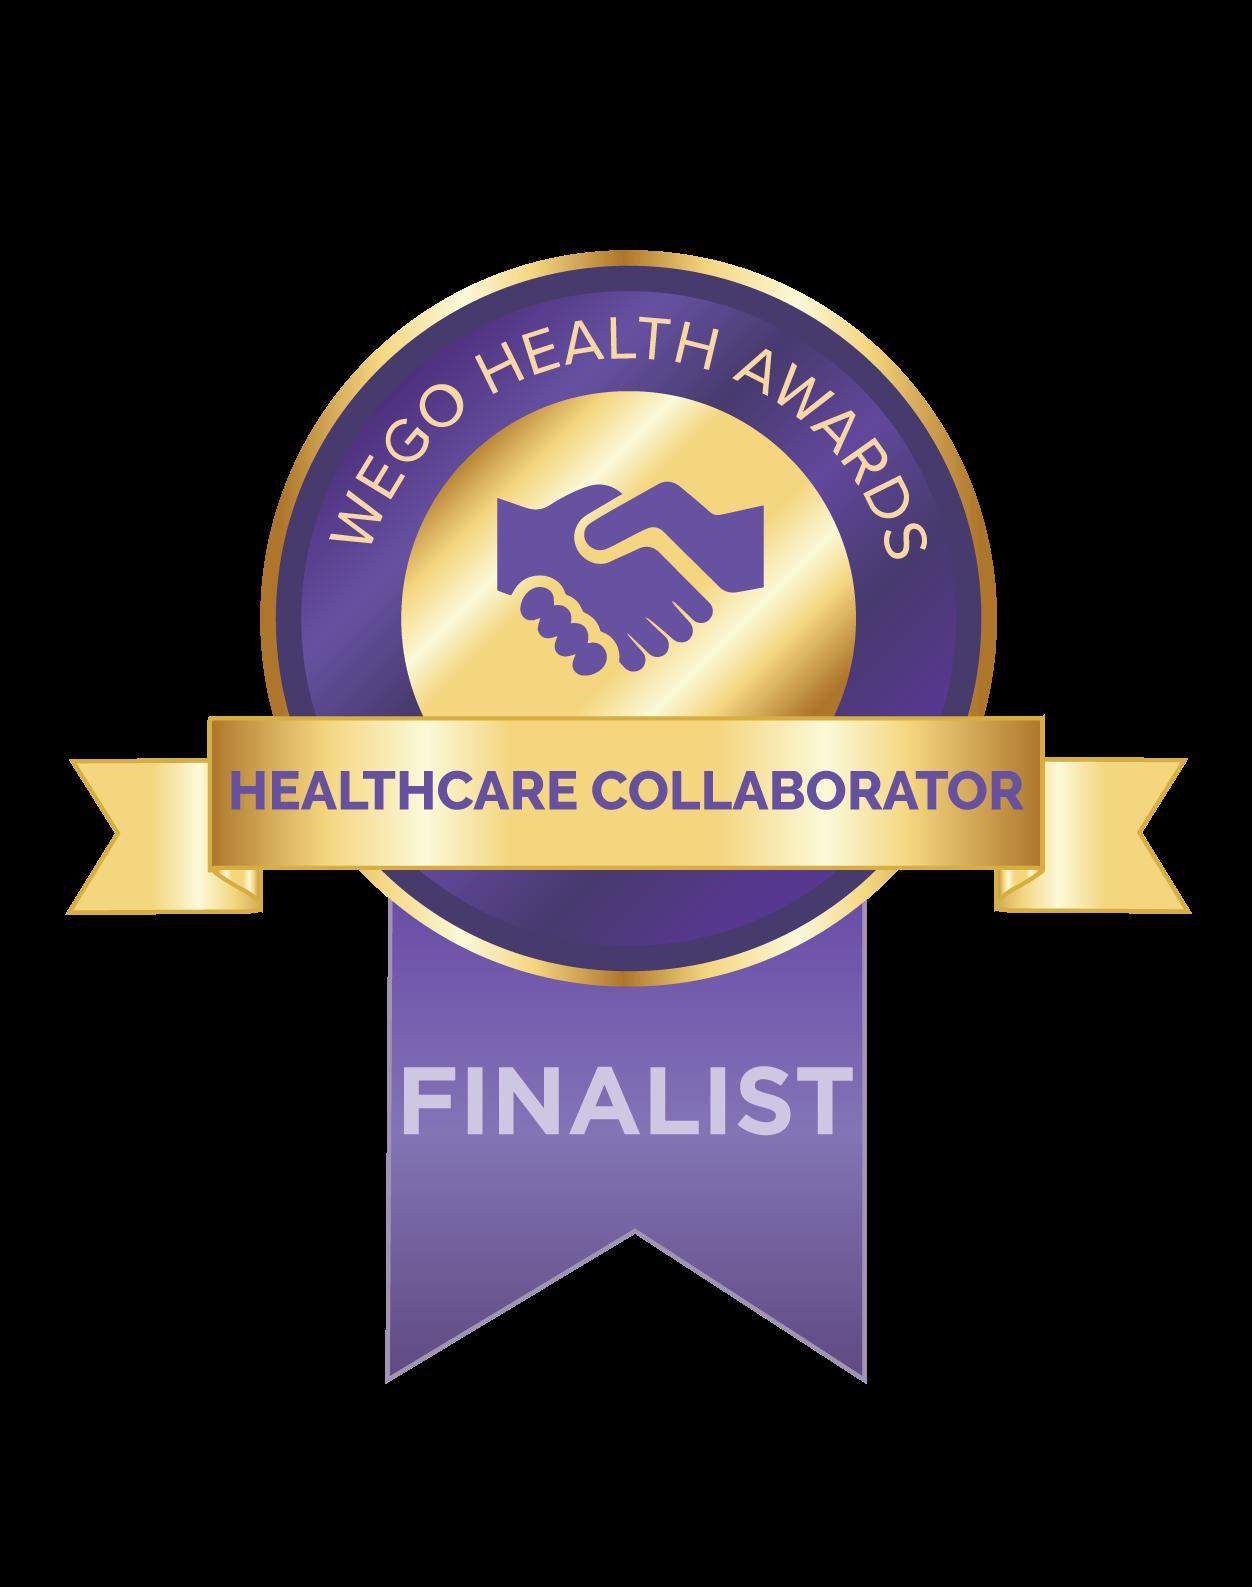 Awards_Collaborator - Finalist_no background